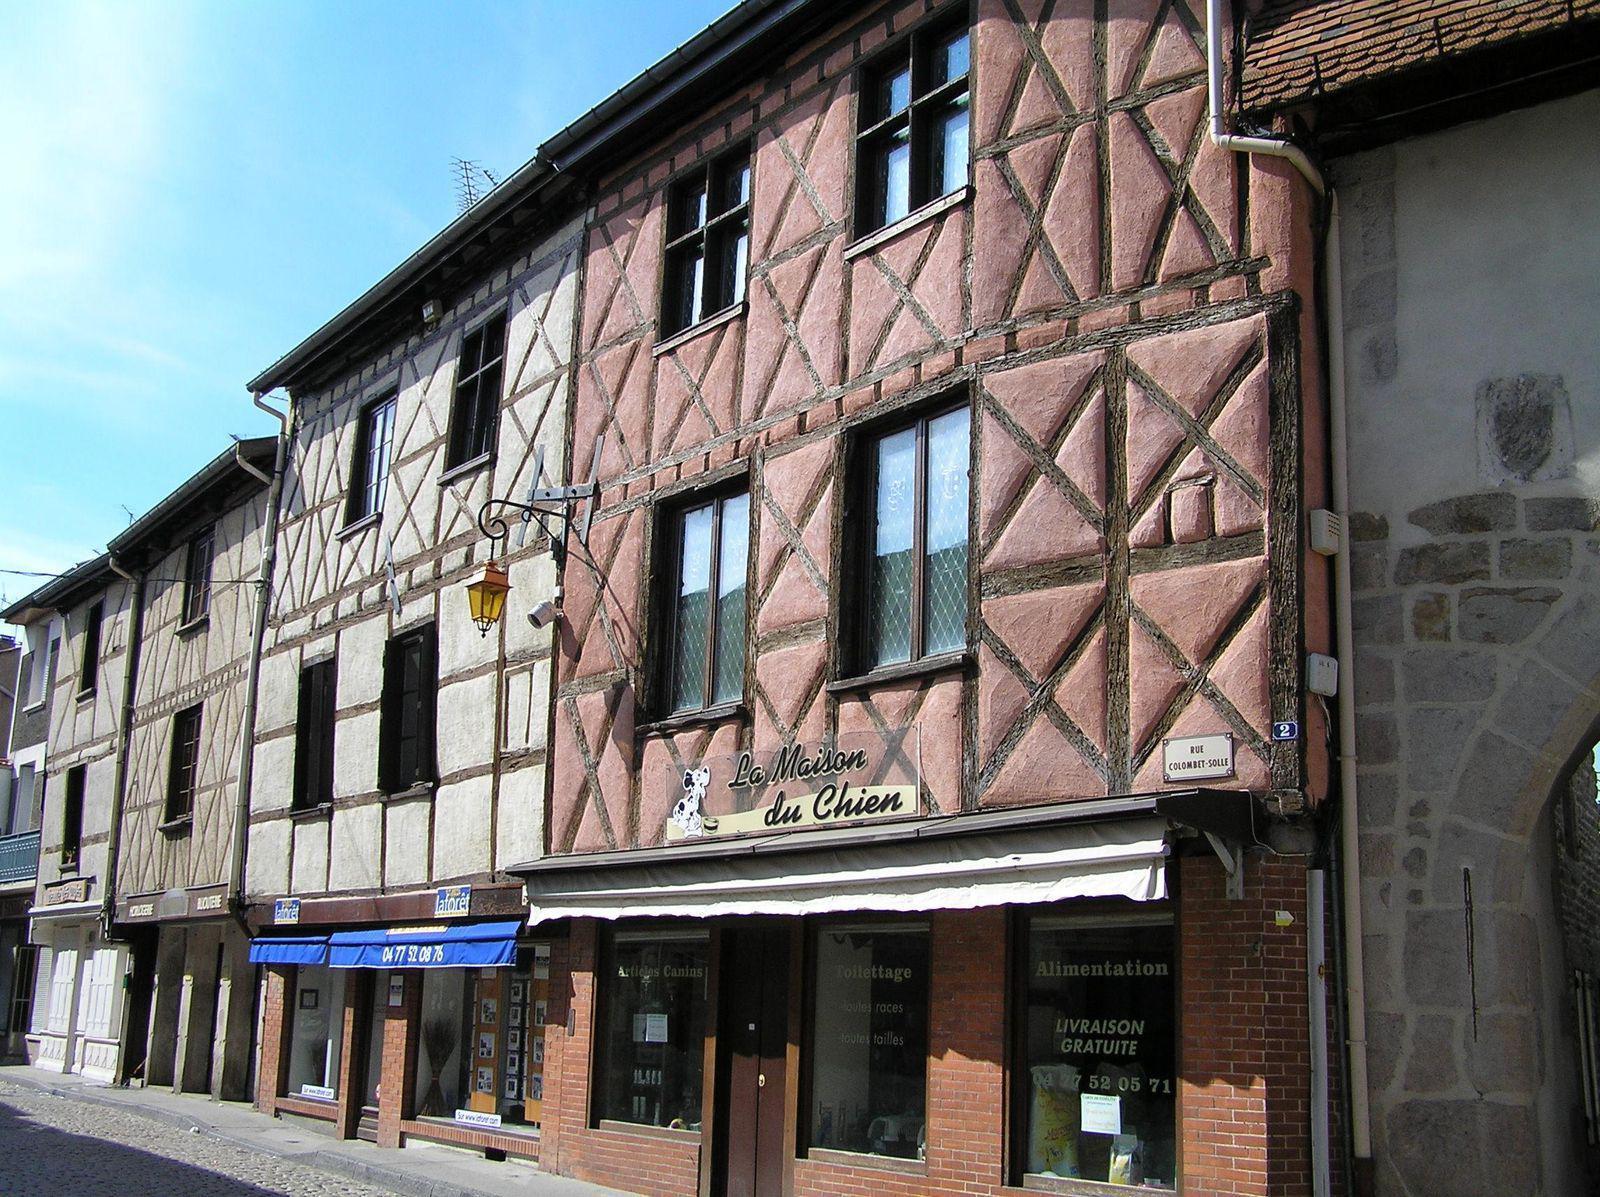 Saint-Just-Saint-Rambert (1)